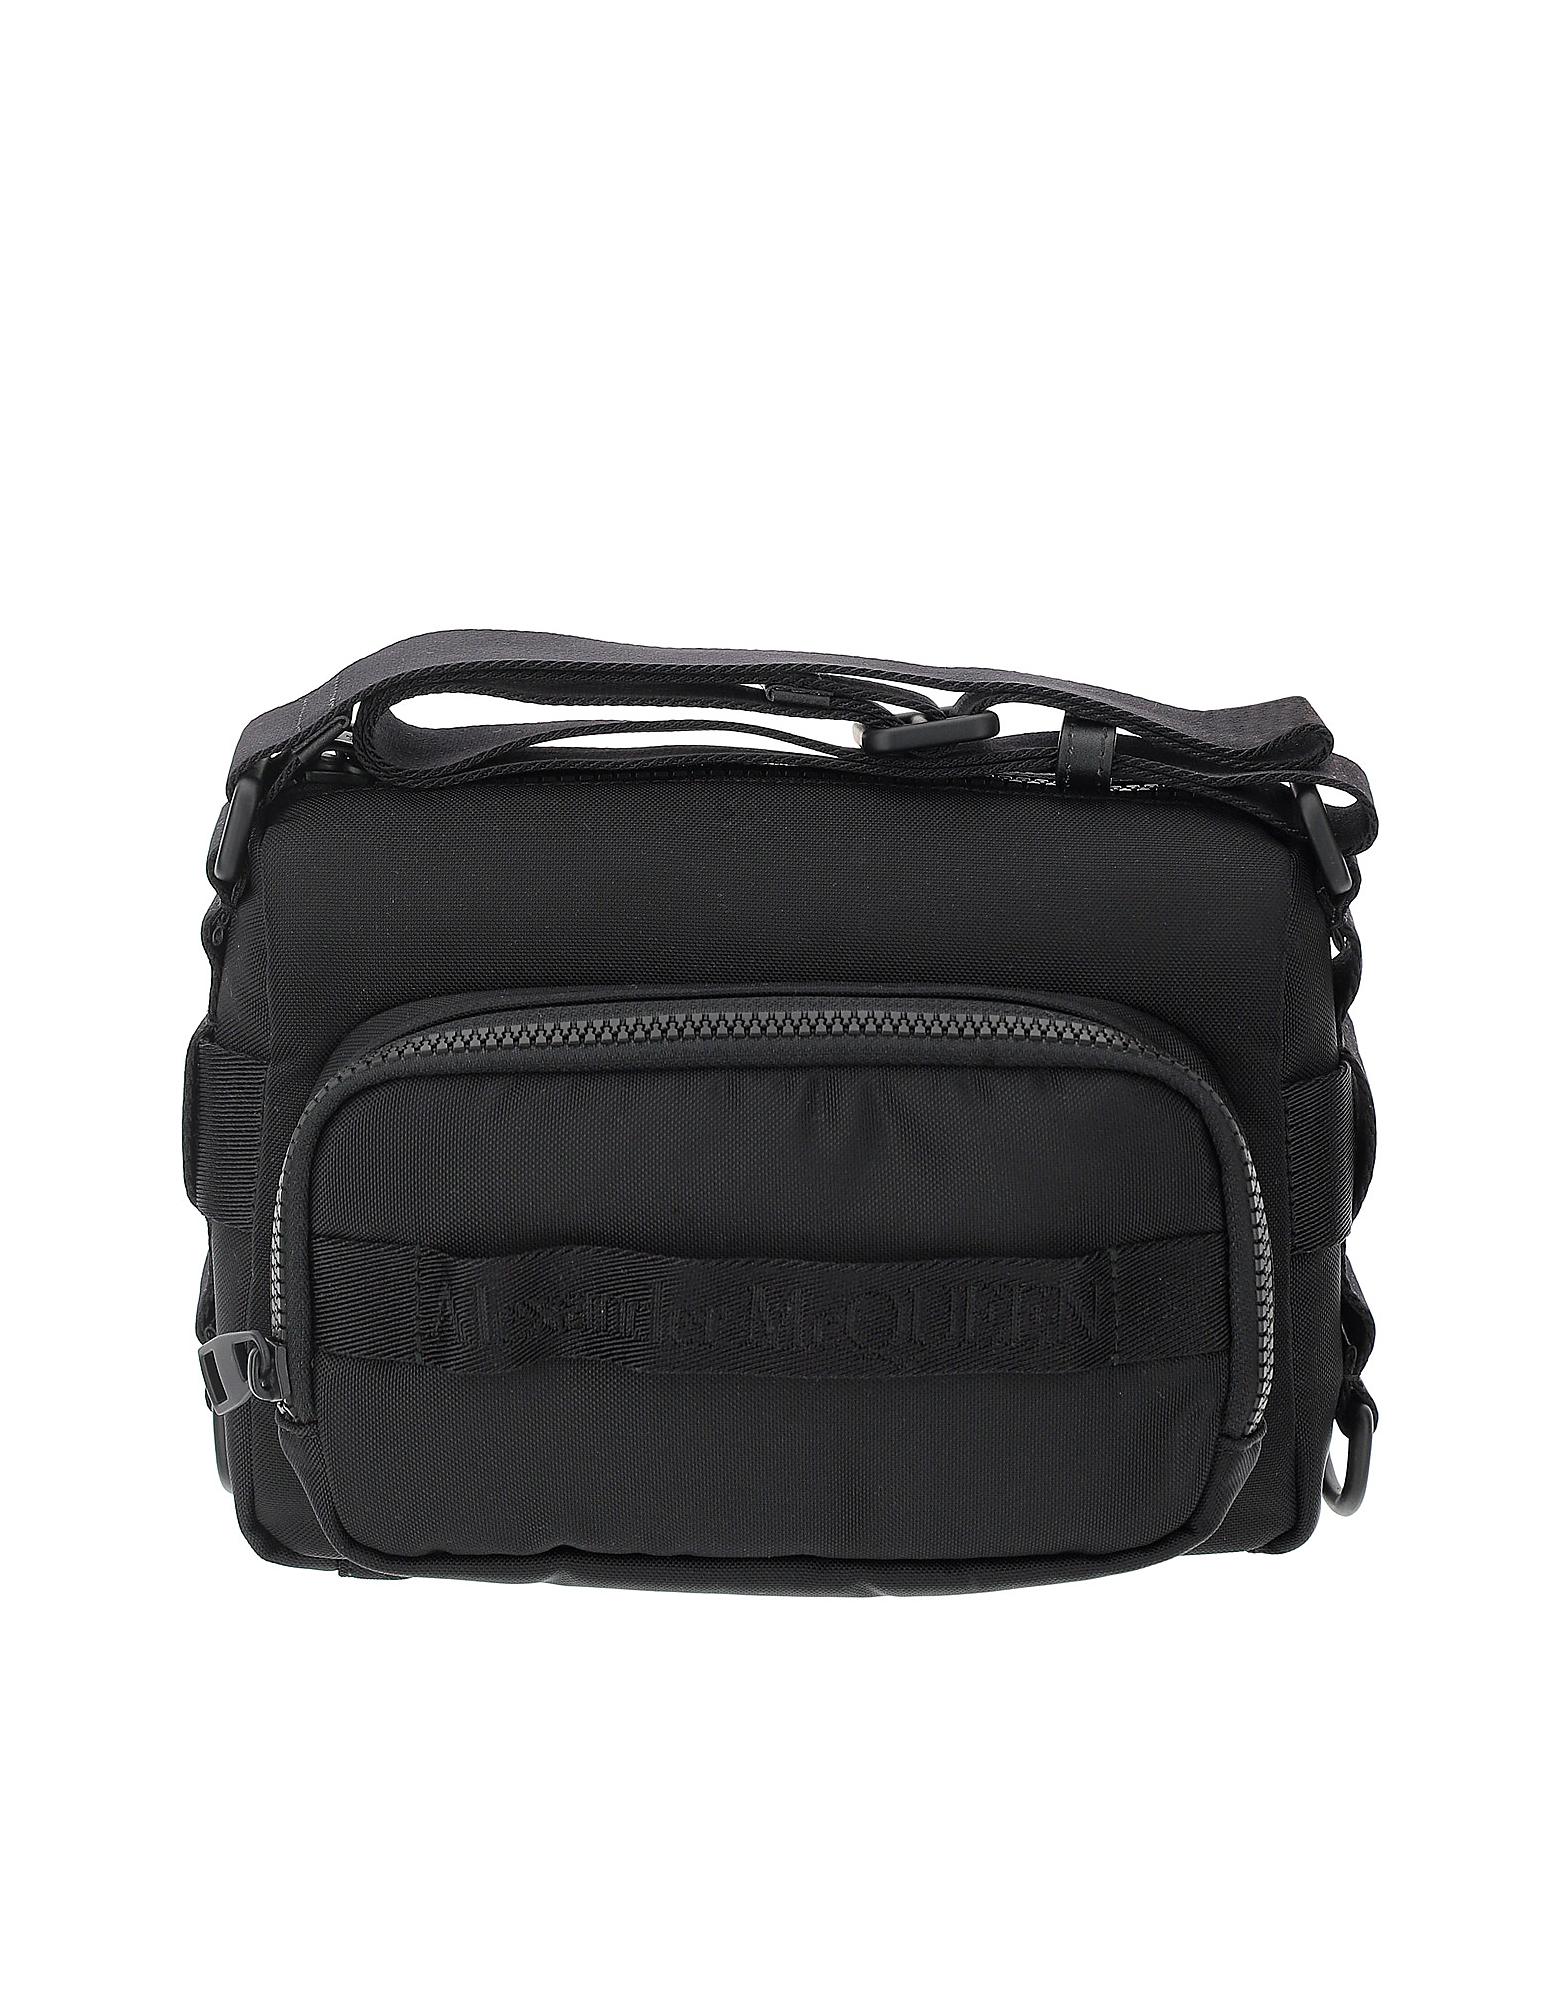 Alexander McQueen Designer Men's Bags, Black Technical Nylon Urban Camera Bag